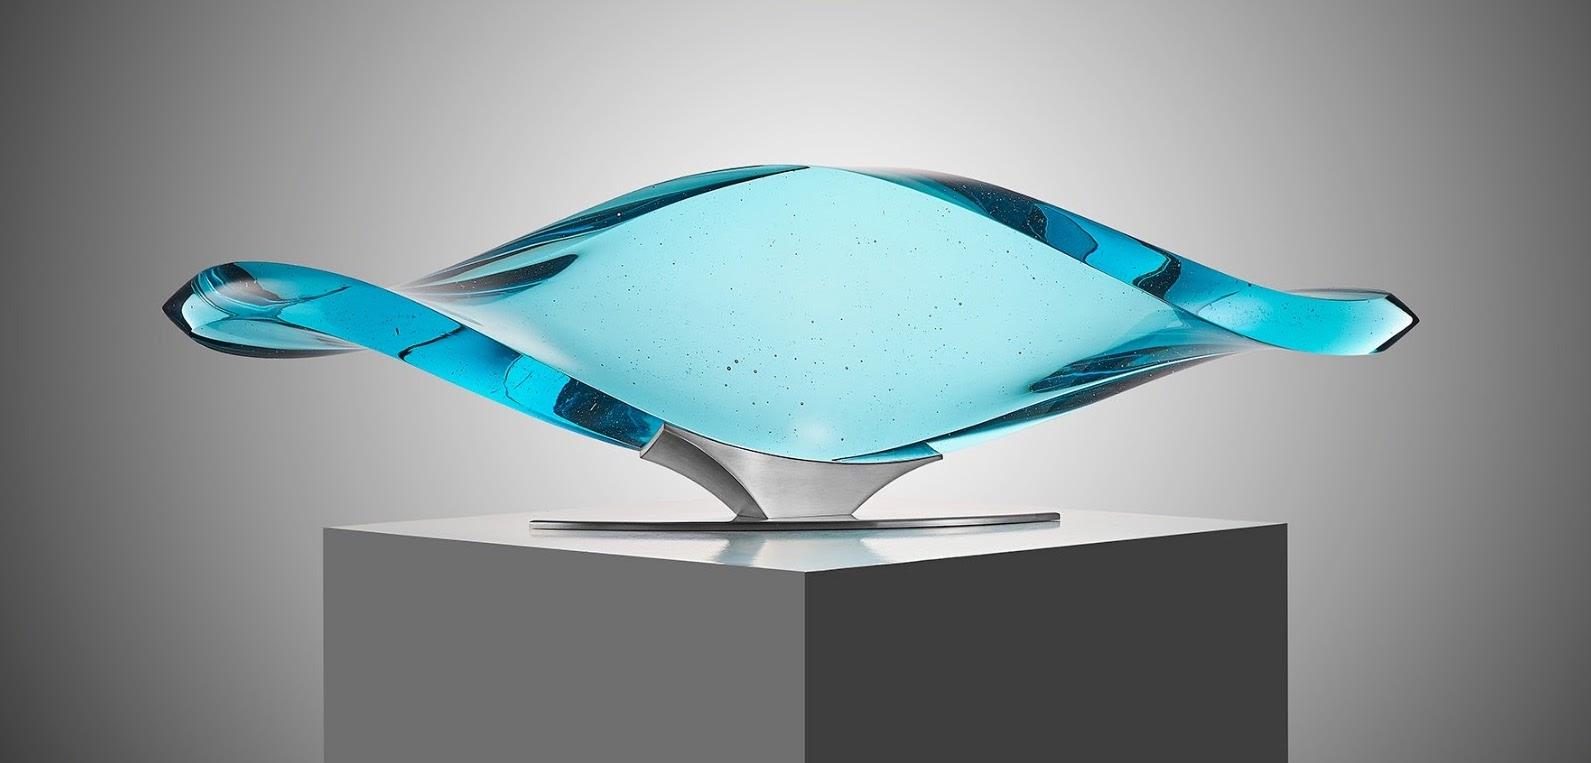 Vlastimil Beranek cast glass art